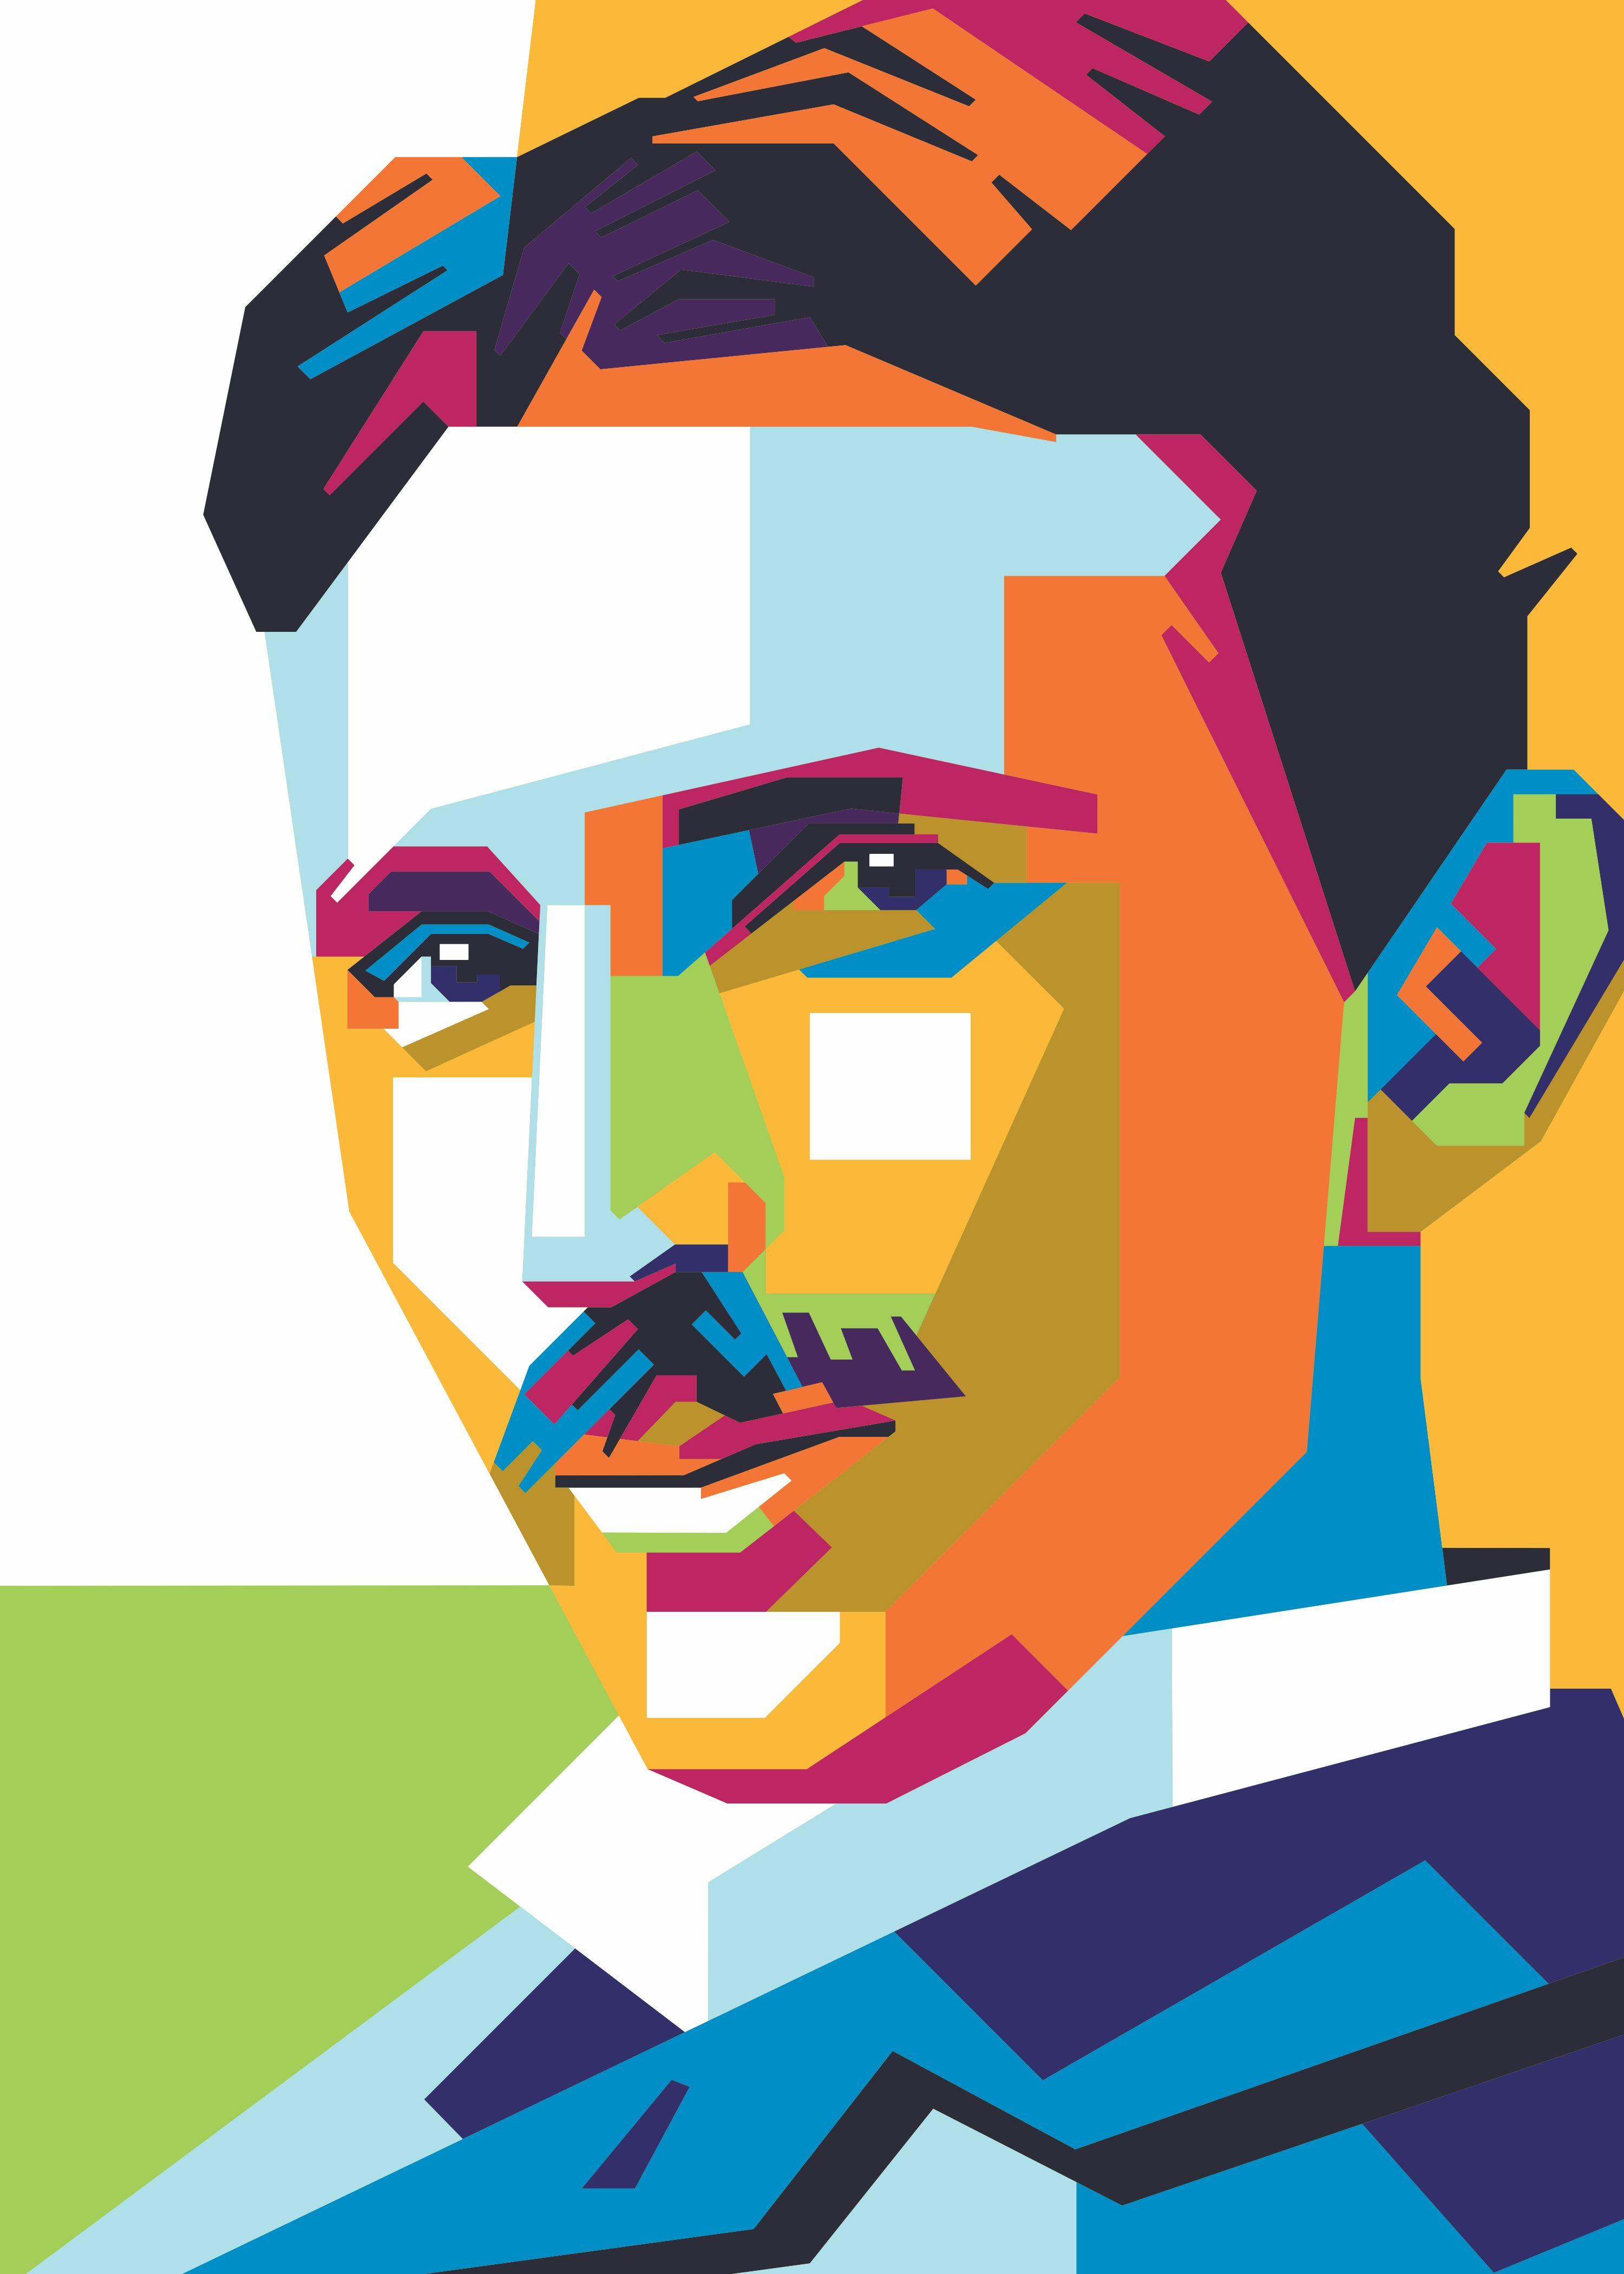 nikola tesla poster by firman alief